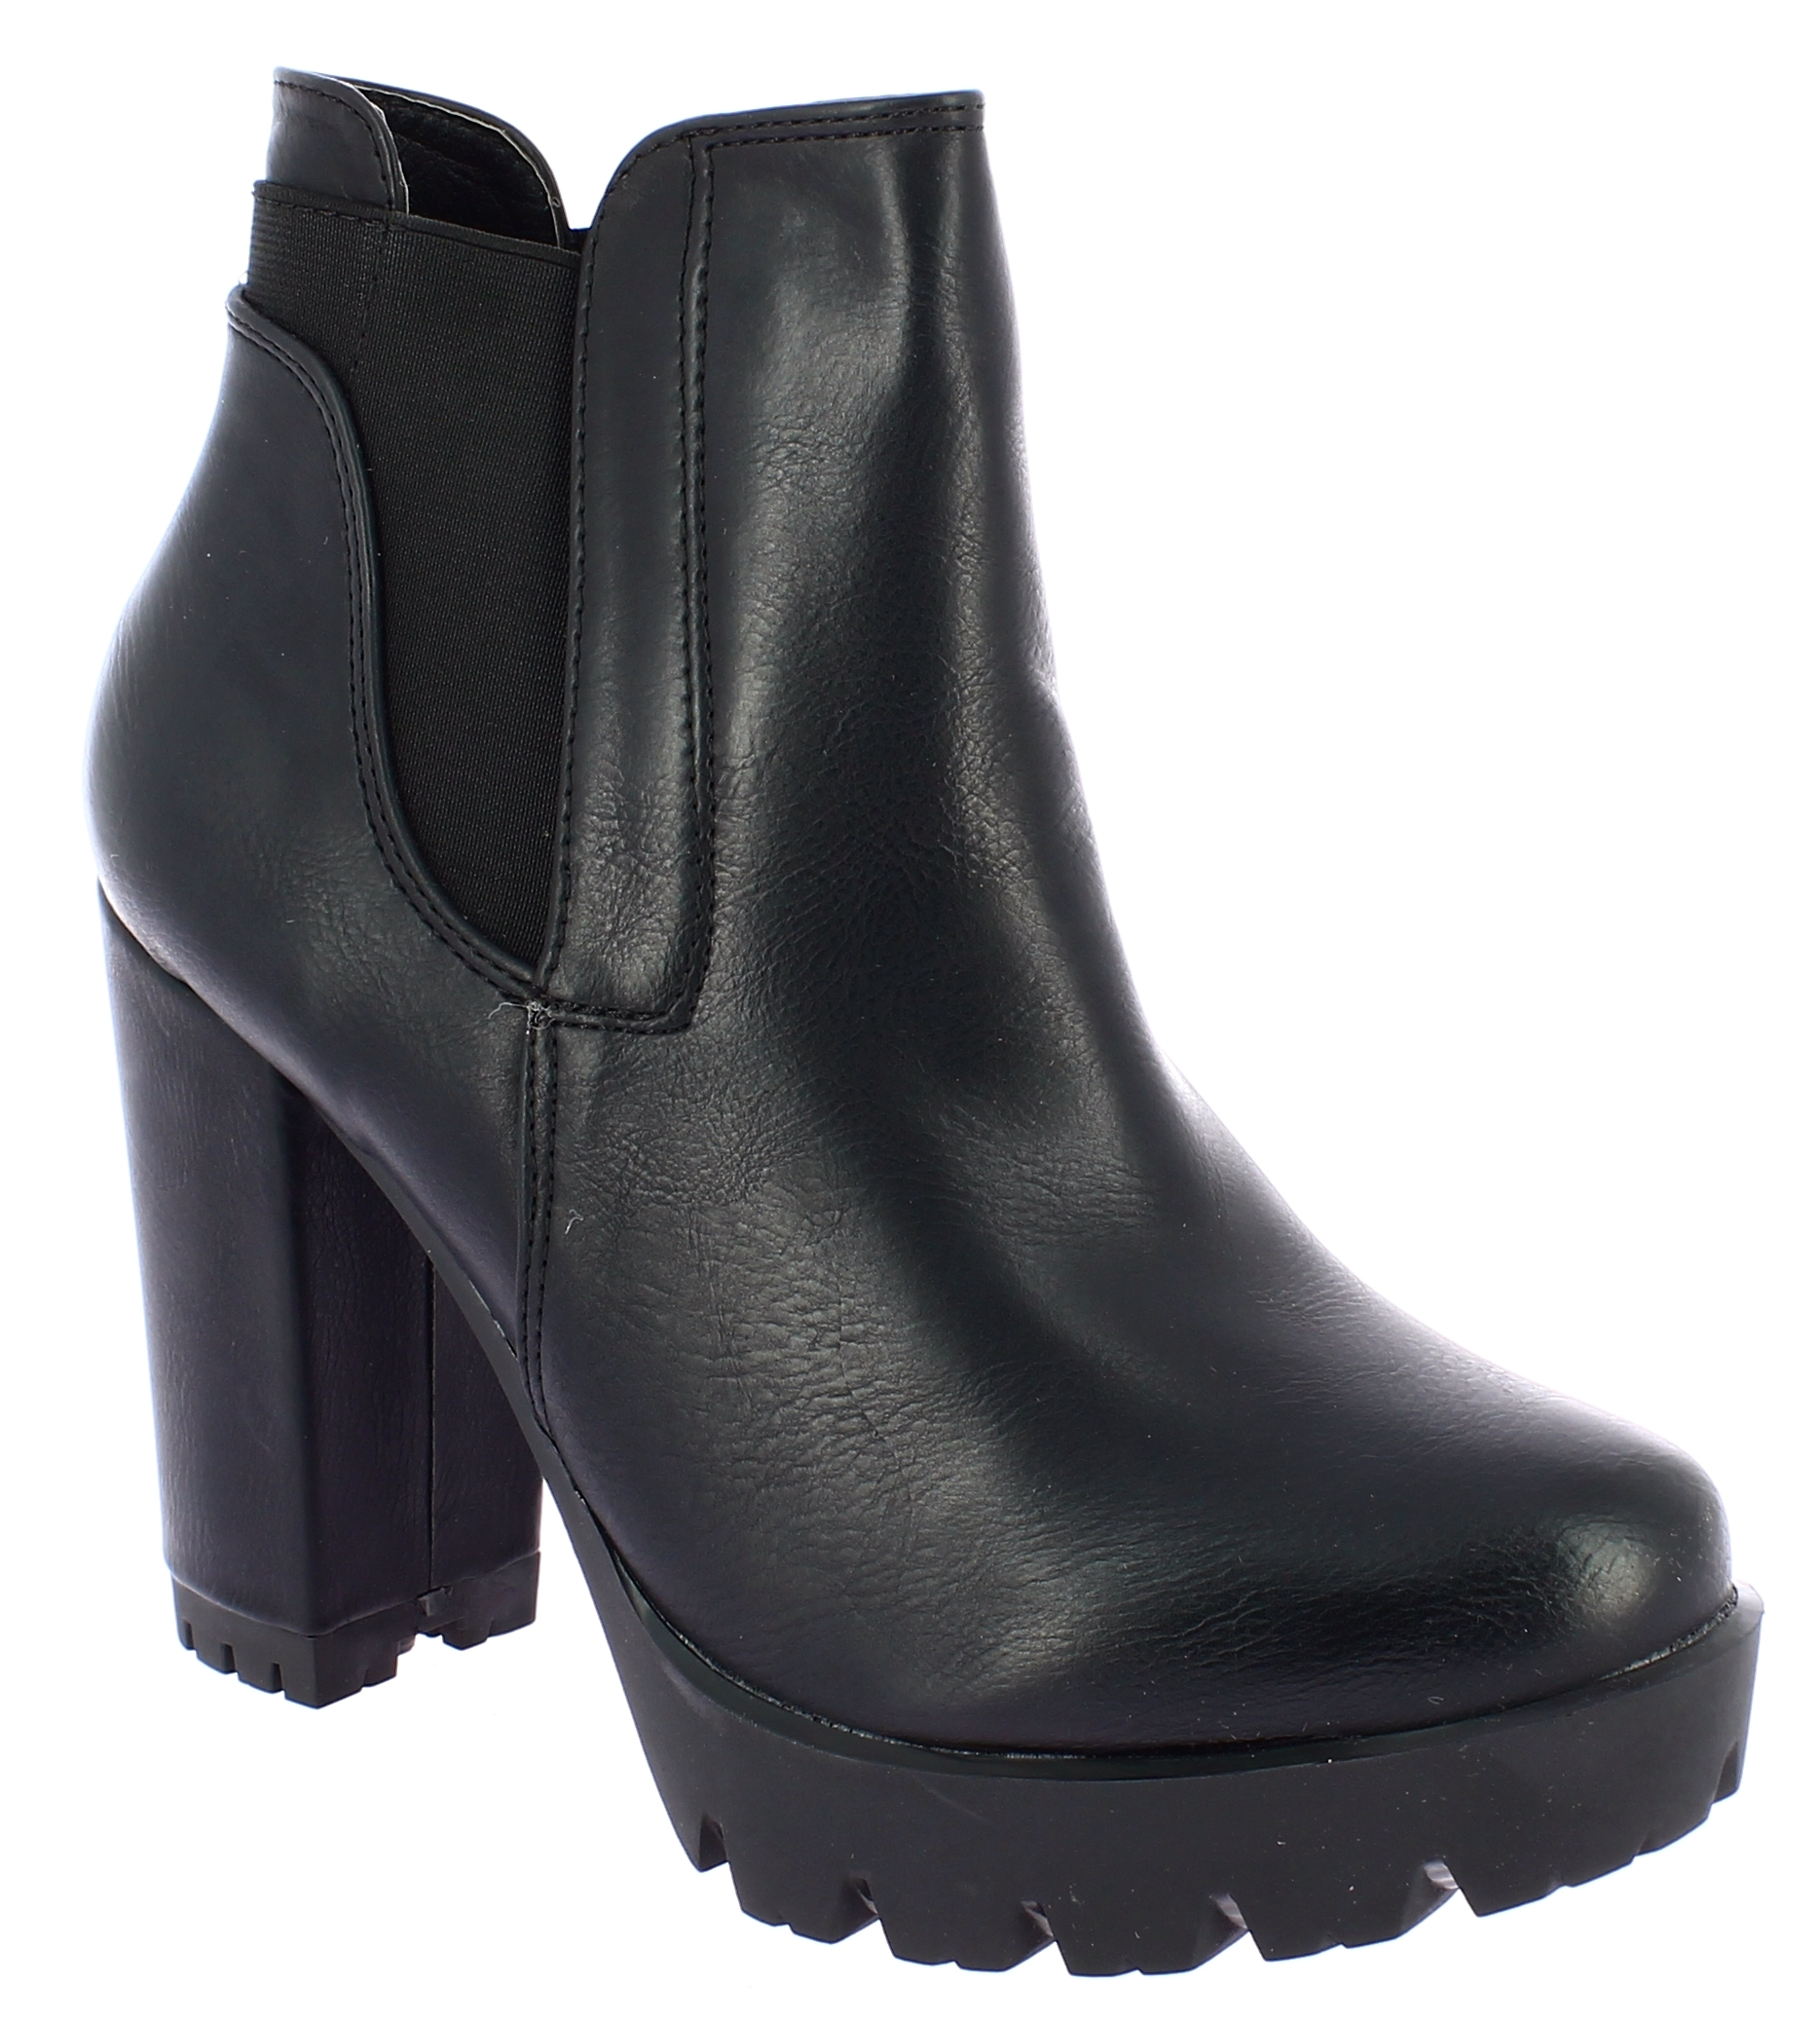 IQSHOES Γυναικείο Μποτάκι YBS-22-BYH-70 Μαύρο - IqShoes - YBS-22-BYH-70 BLACK-IQ παπούτσια  προσφορεσ